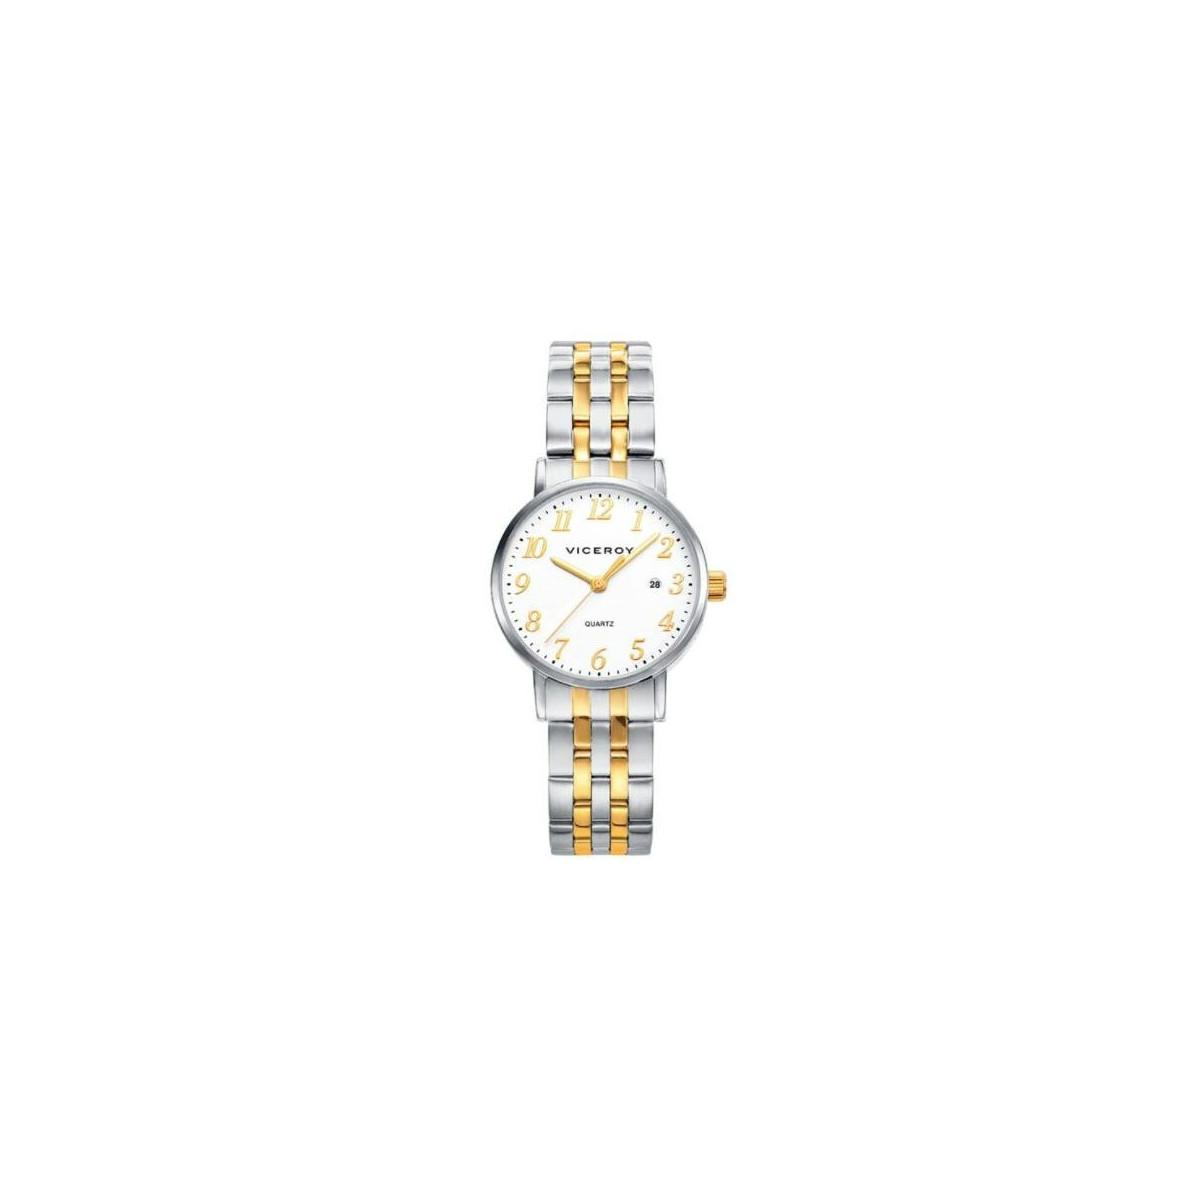 Reloj Viceroy Bicolor 42224-94